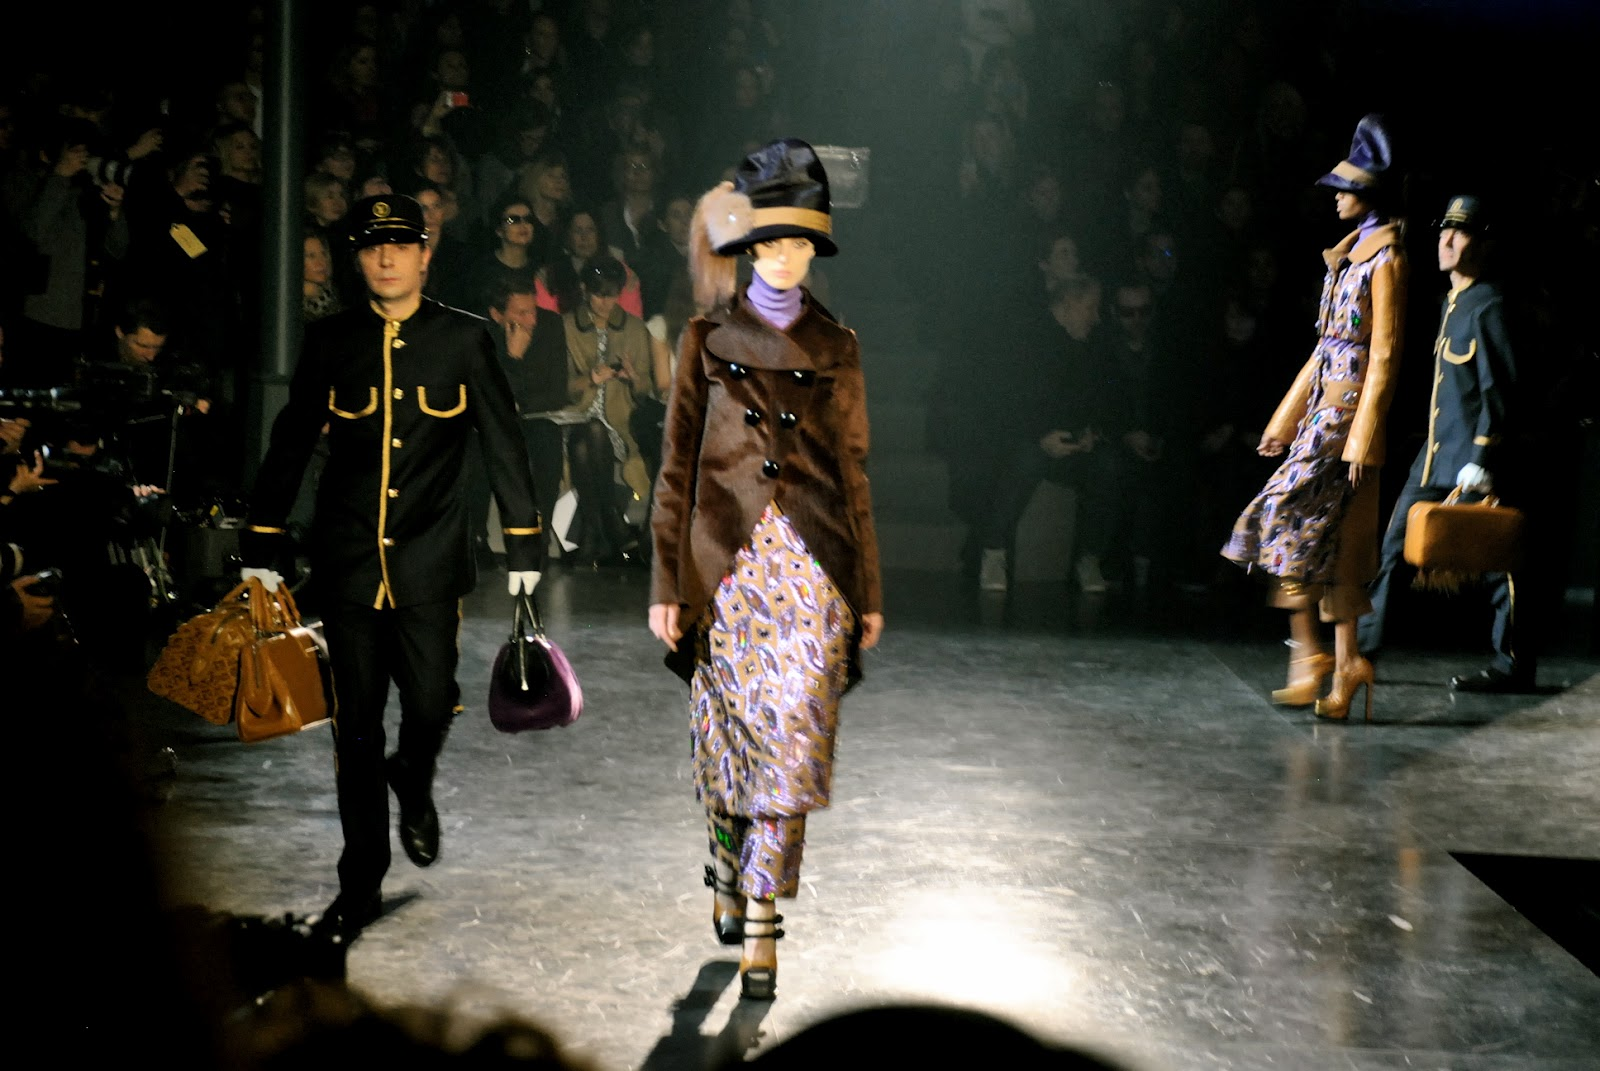 http://3.bp.blogspot.com/-YNGZ3koDSVY/T2mhjQAUTqI/AAAAAAABHcc/ihz0M5nwNnc/s1600/Louis+Vuitton+Fall+2012+Runway+Show+Train+Paris+Fashion+Week+Review+by+Kristin+Knox+The+Clothes+Whisperer+Blog_0711.JPG